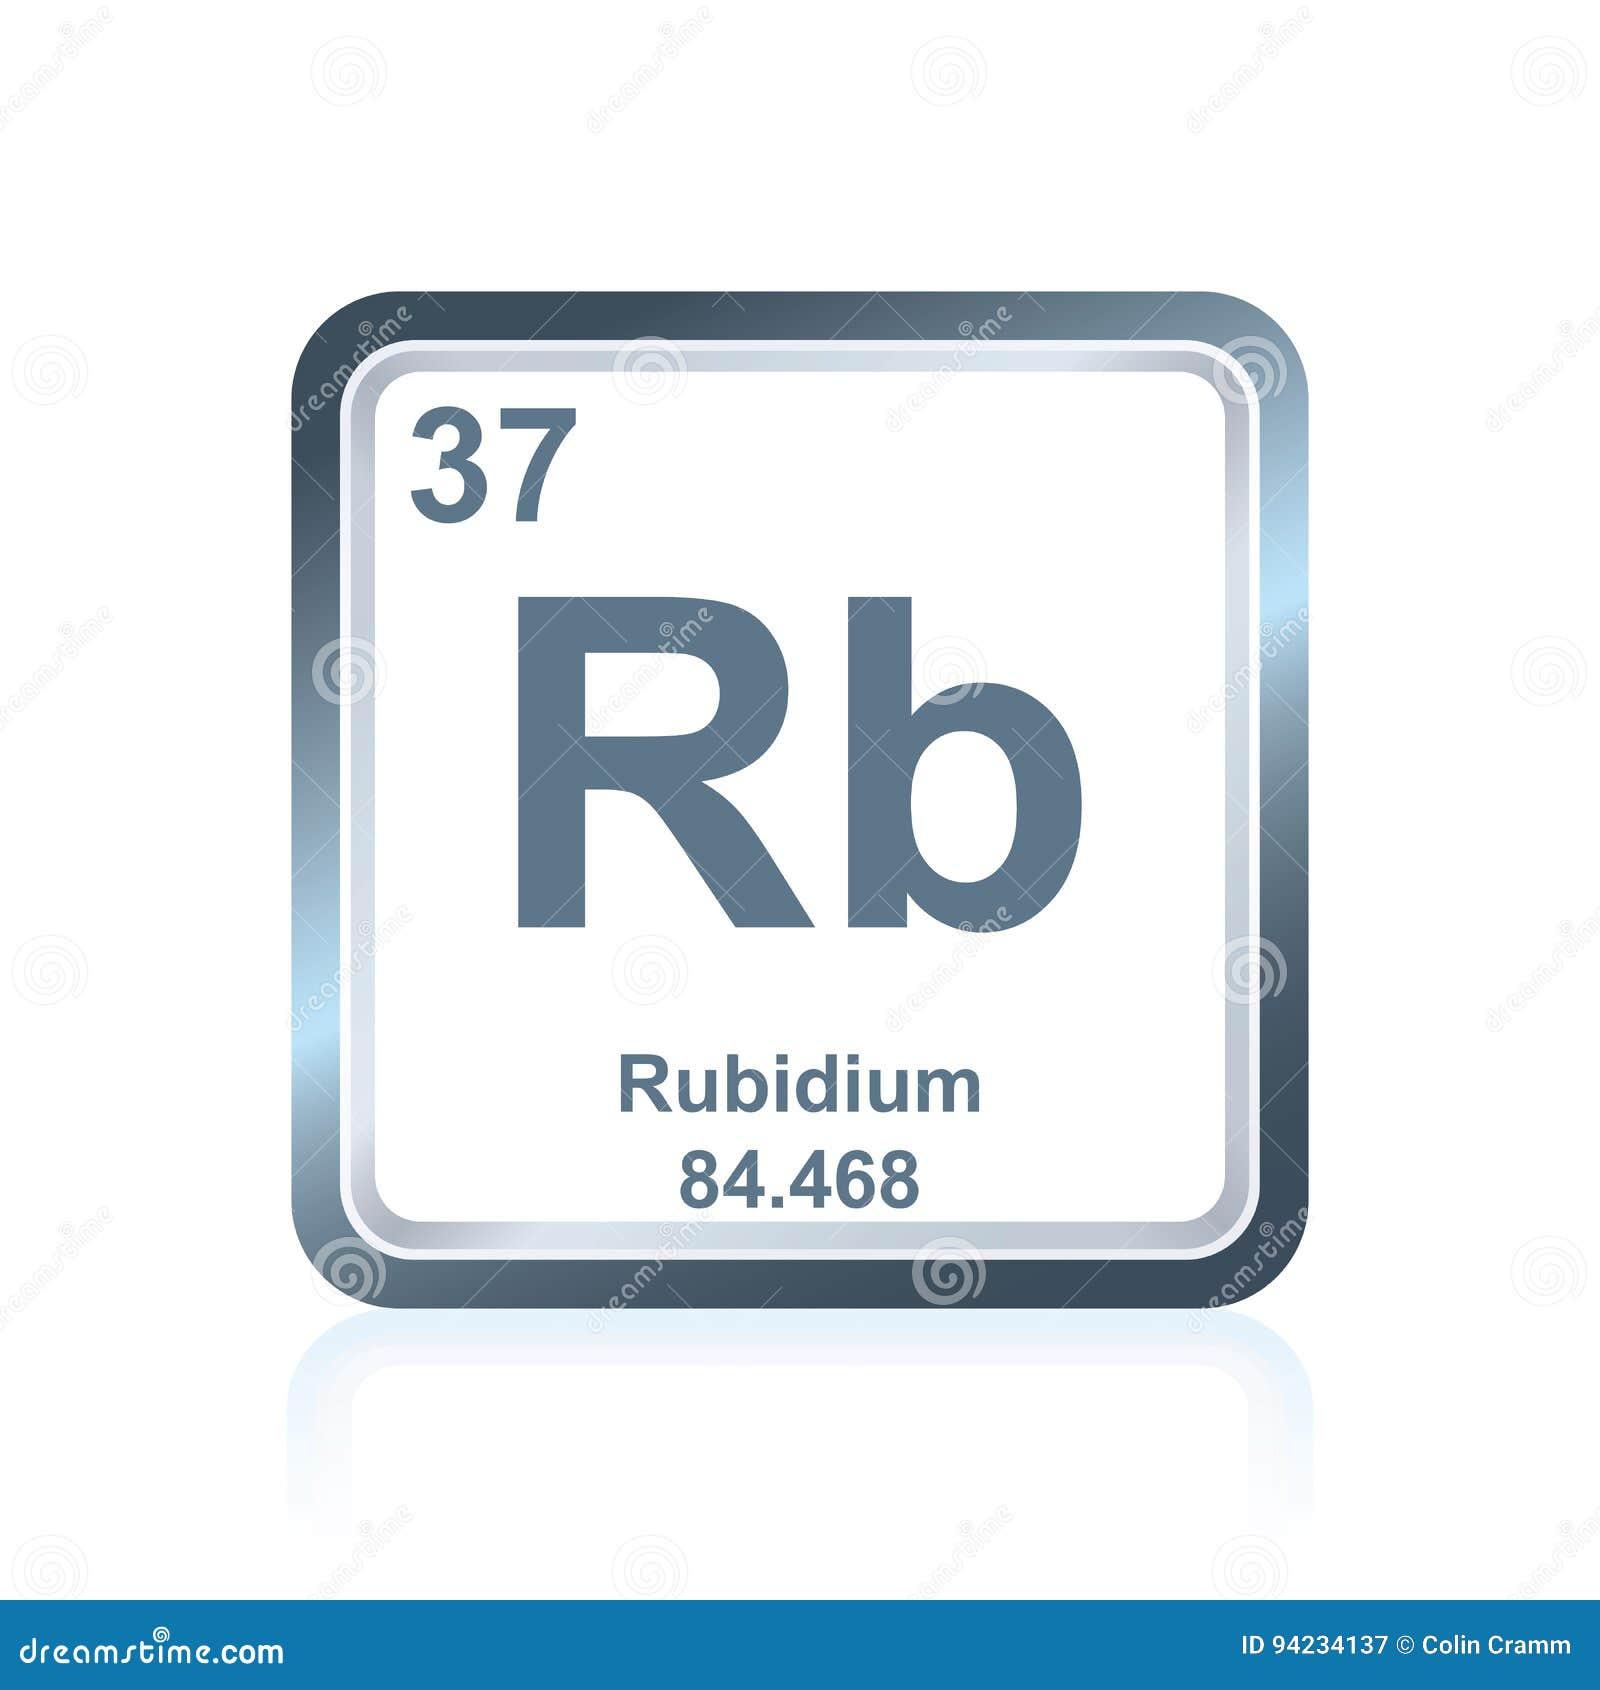 Chemical element rubidium from the periodic table stock illustration chemical element rubidium from the periodic table buycottarizona Choice Image